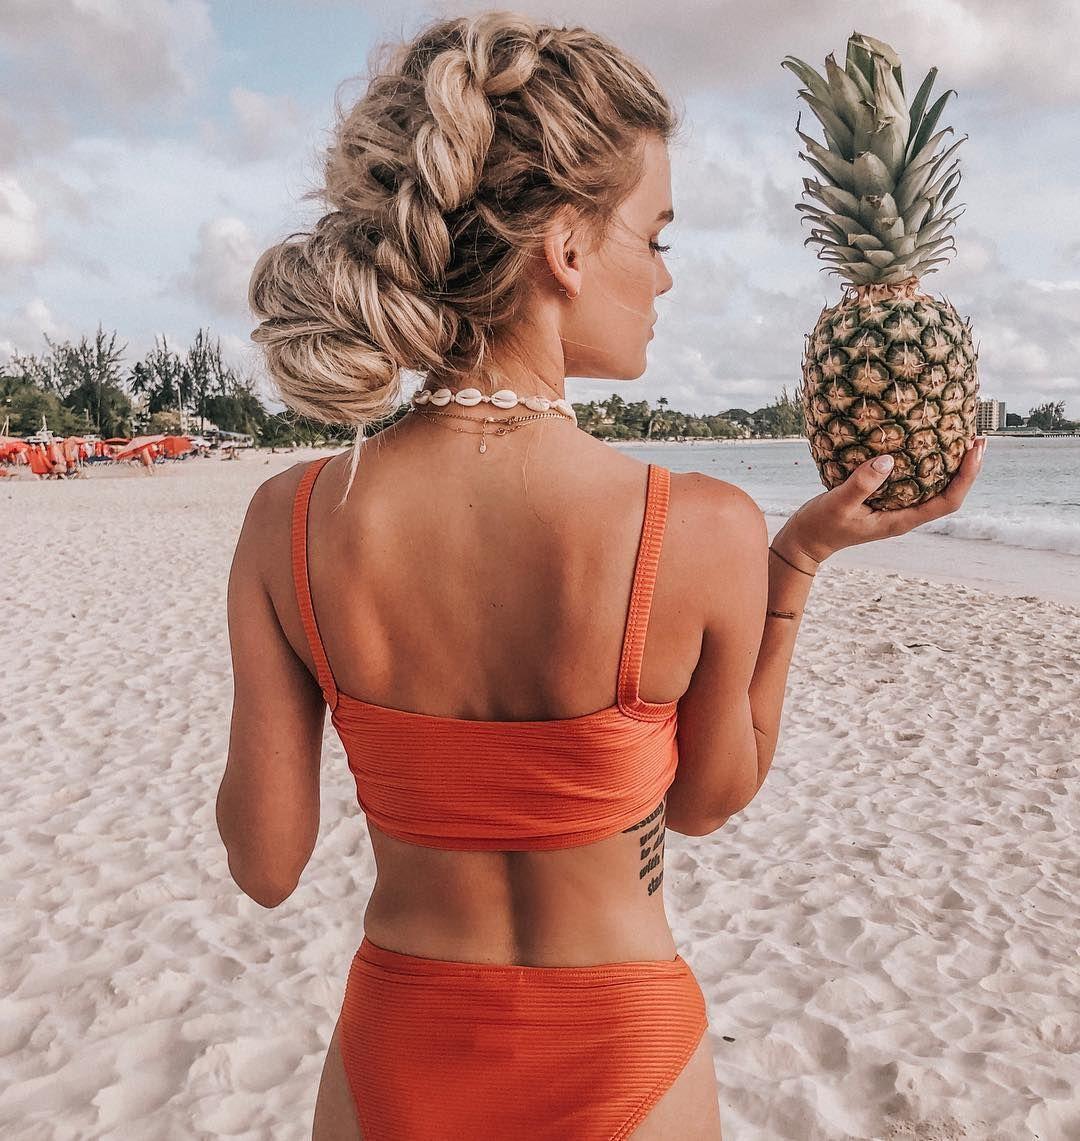 "Chrissy Rasmussen on Instagram: ""Pineapple 🍍 Beach 🏝 // by @hairby_chrissy w/ @lindseyraerogers & @habitextensionmethod"""